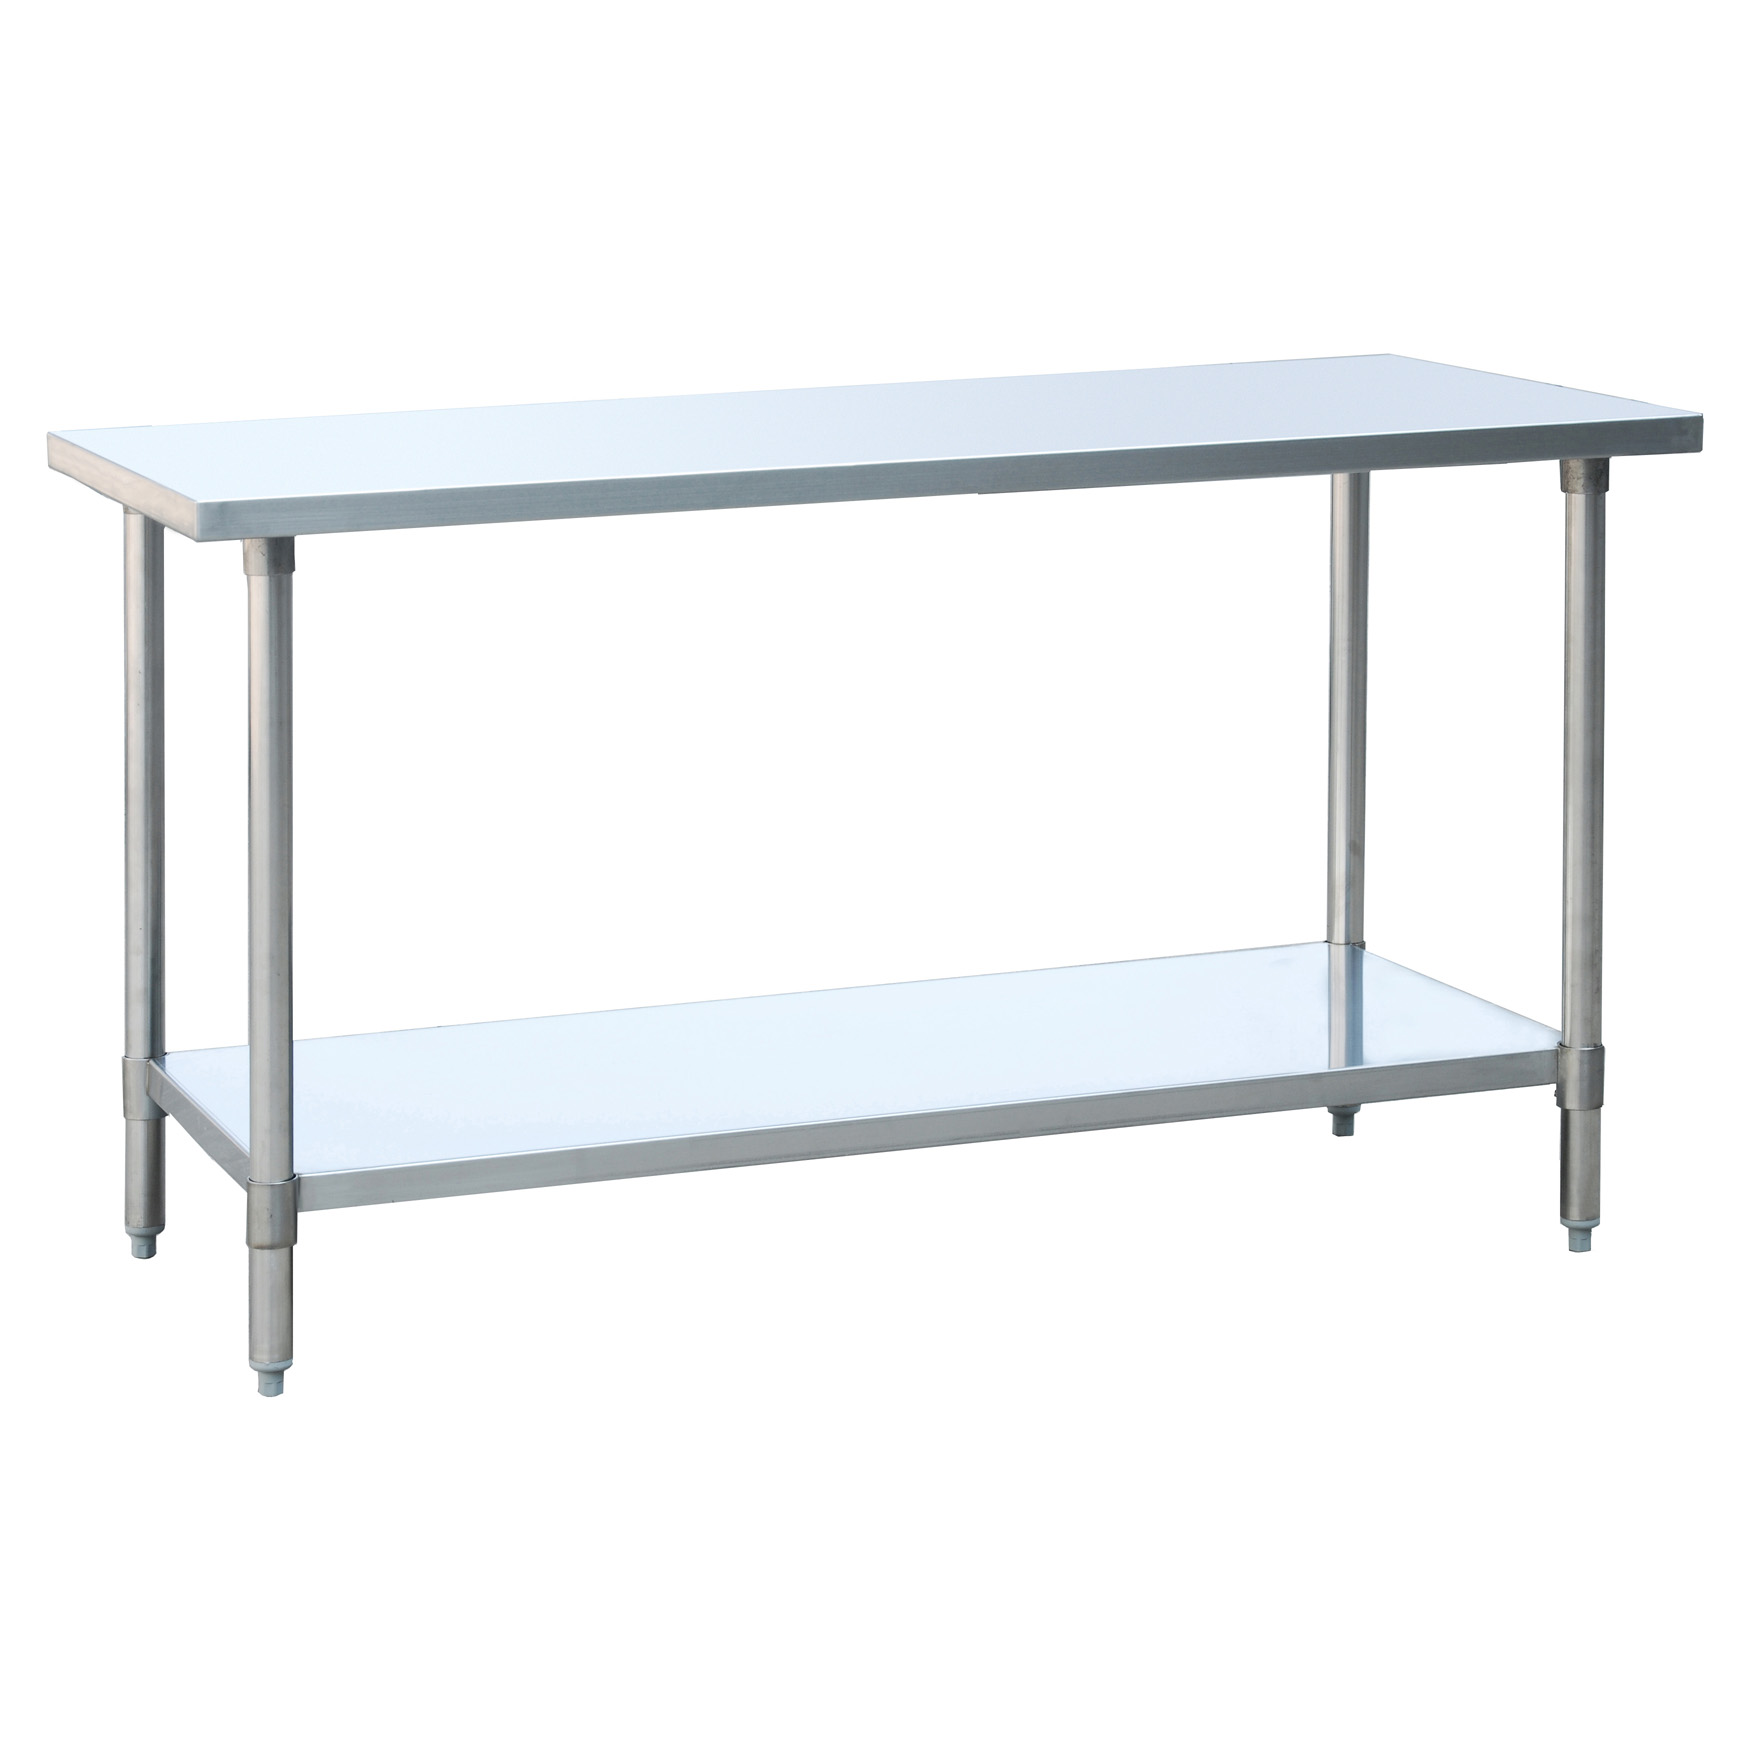 Atosa USA MRTW-3030 work table,  30